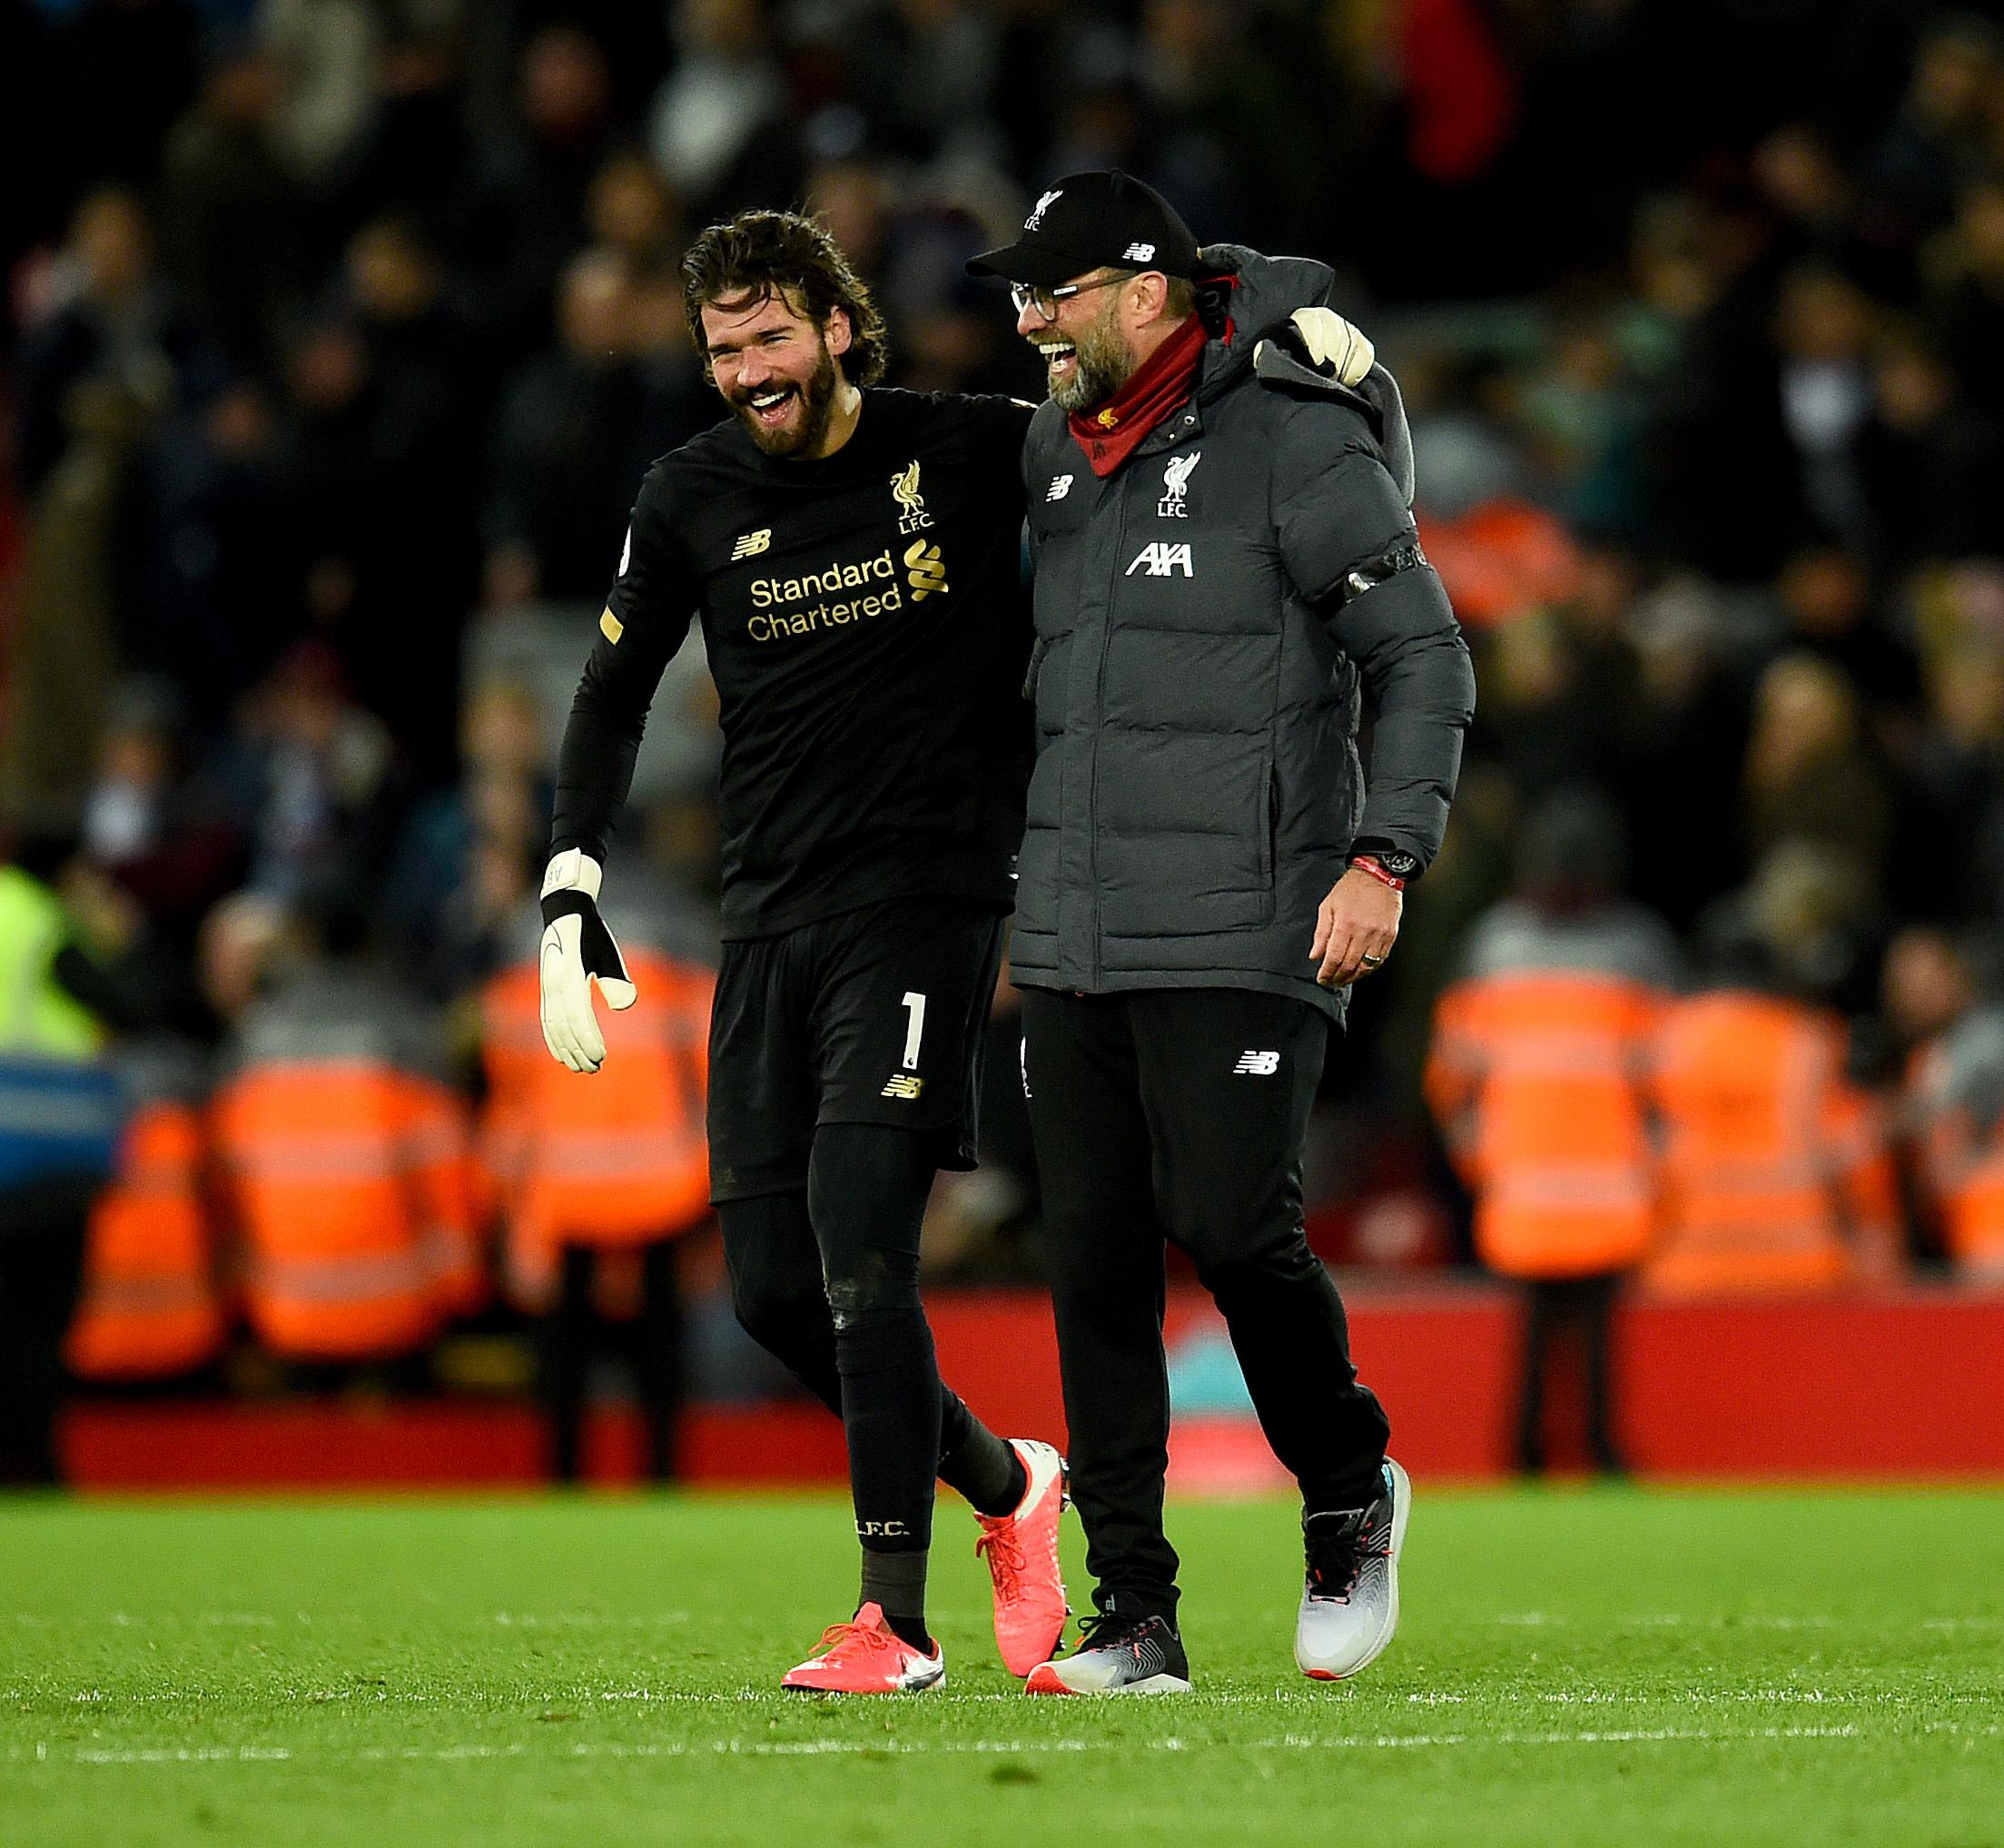 Jurgen Klopp with Alisson Becker - Liverpool FC v West Ham United - Premier League